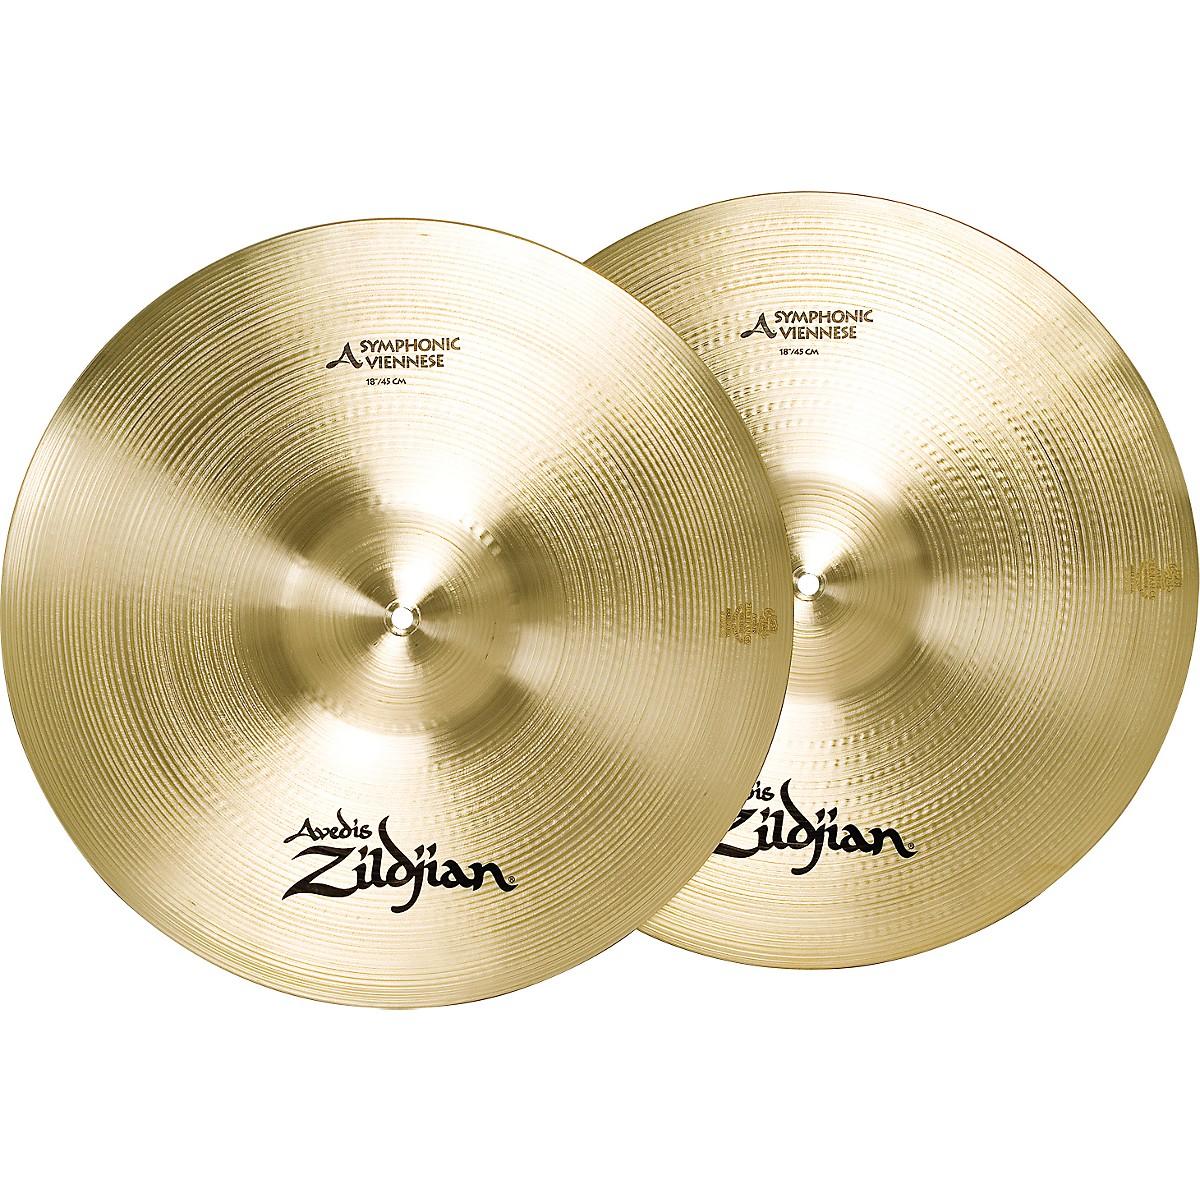 Zildjian A Symphonic Viennese Tone Crash Cymbal Pair